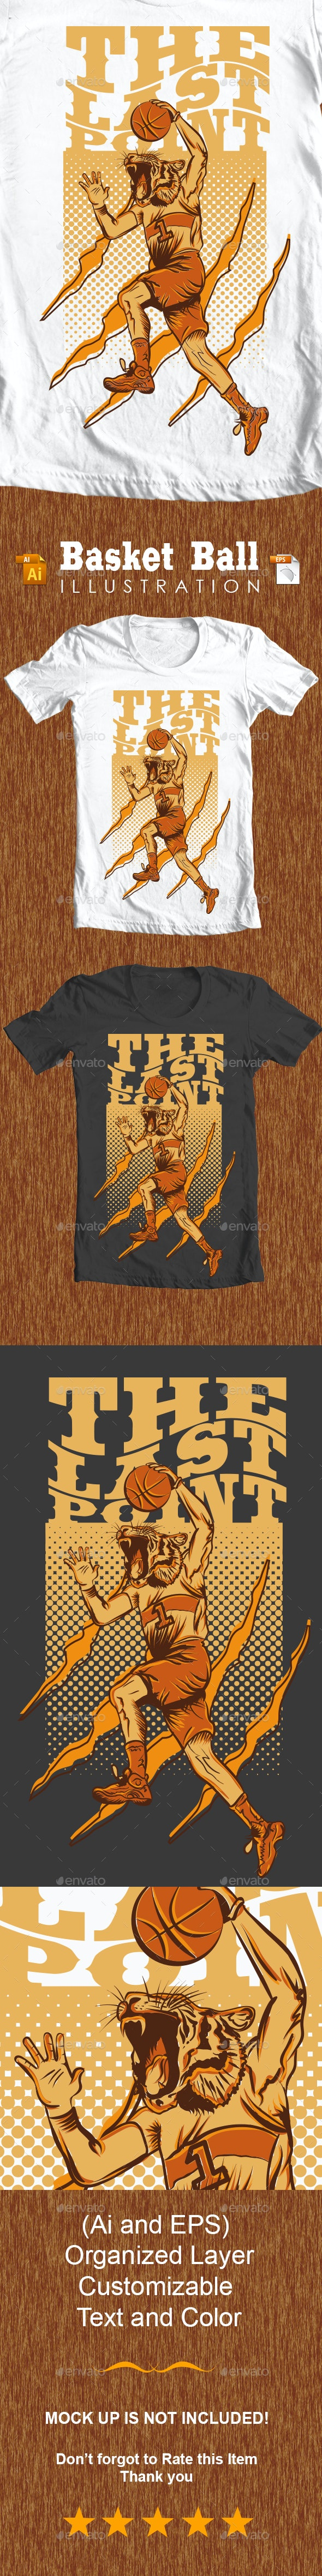 BasketBall Illustration for T-Shirt - Sports & Teams T-Shirts